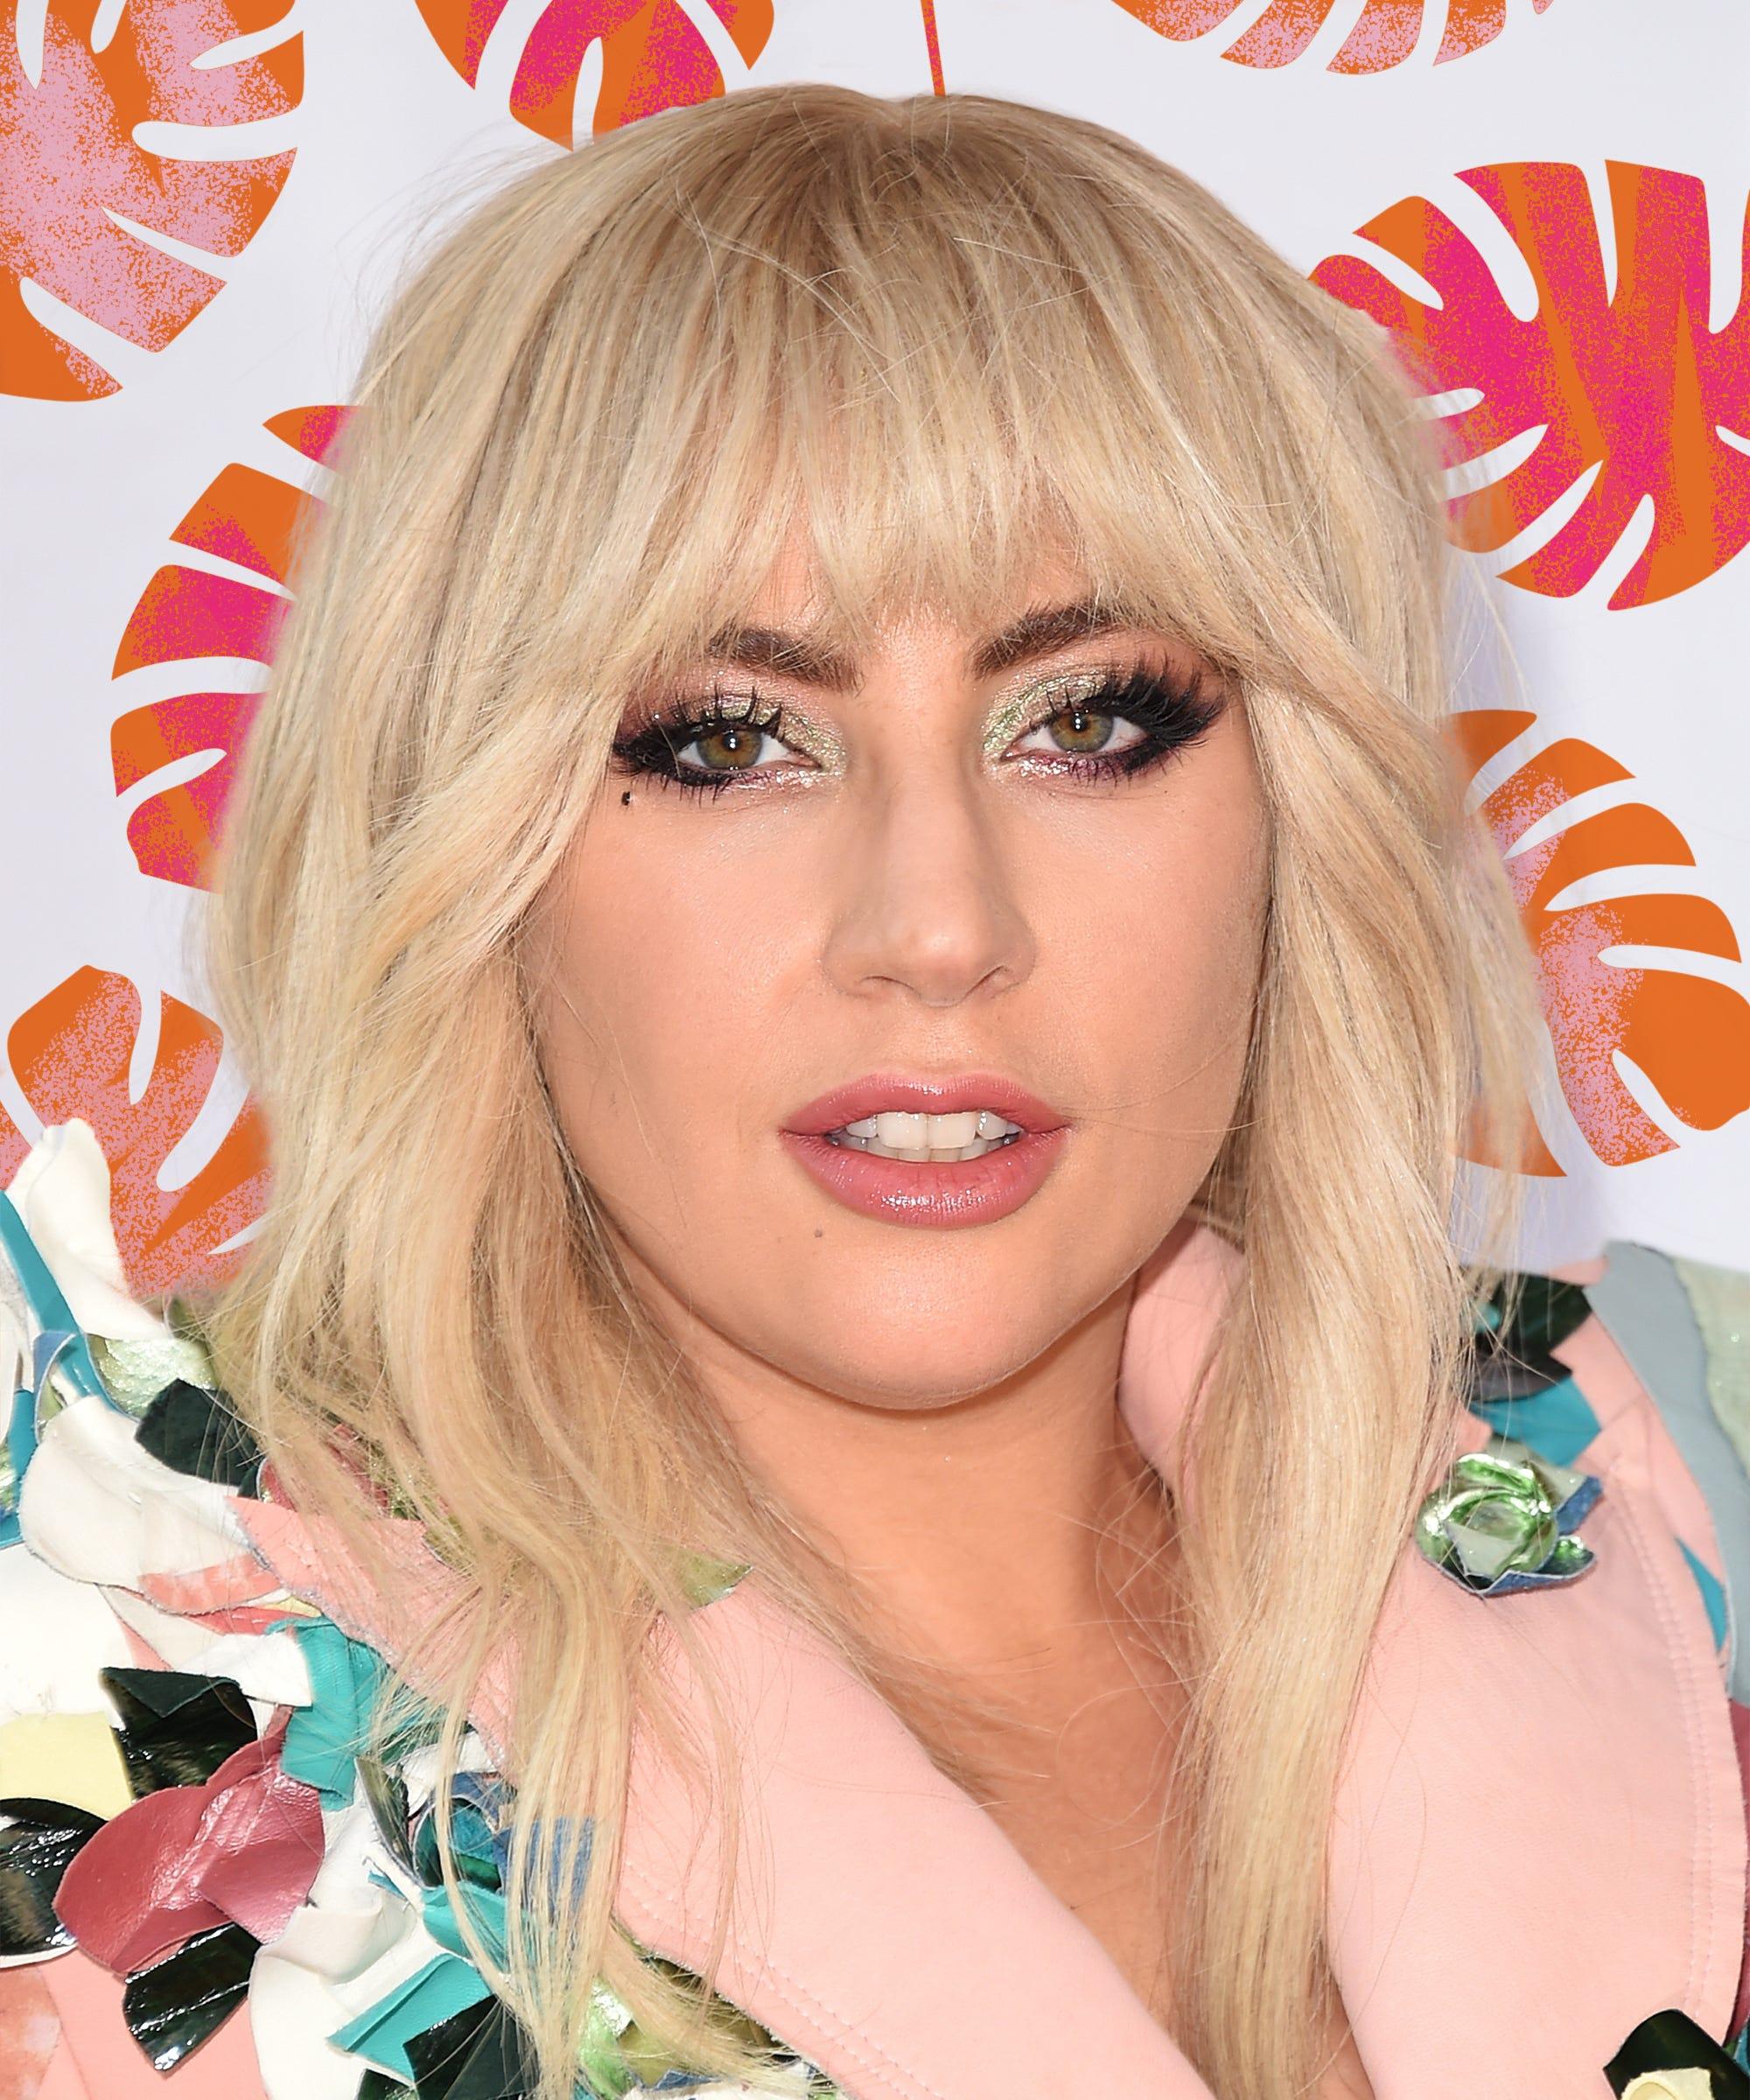 Lady Gaga Wax Figure Peru Twitter Reactions